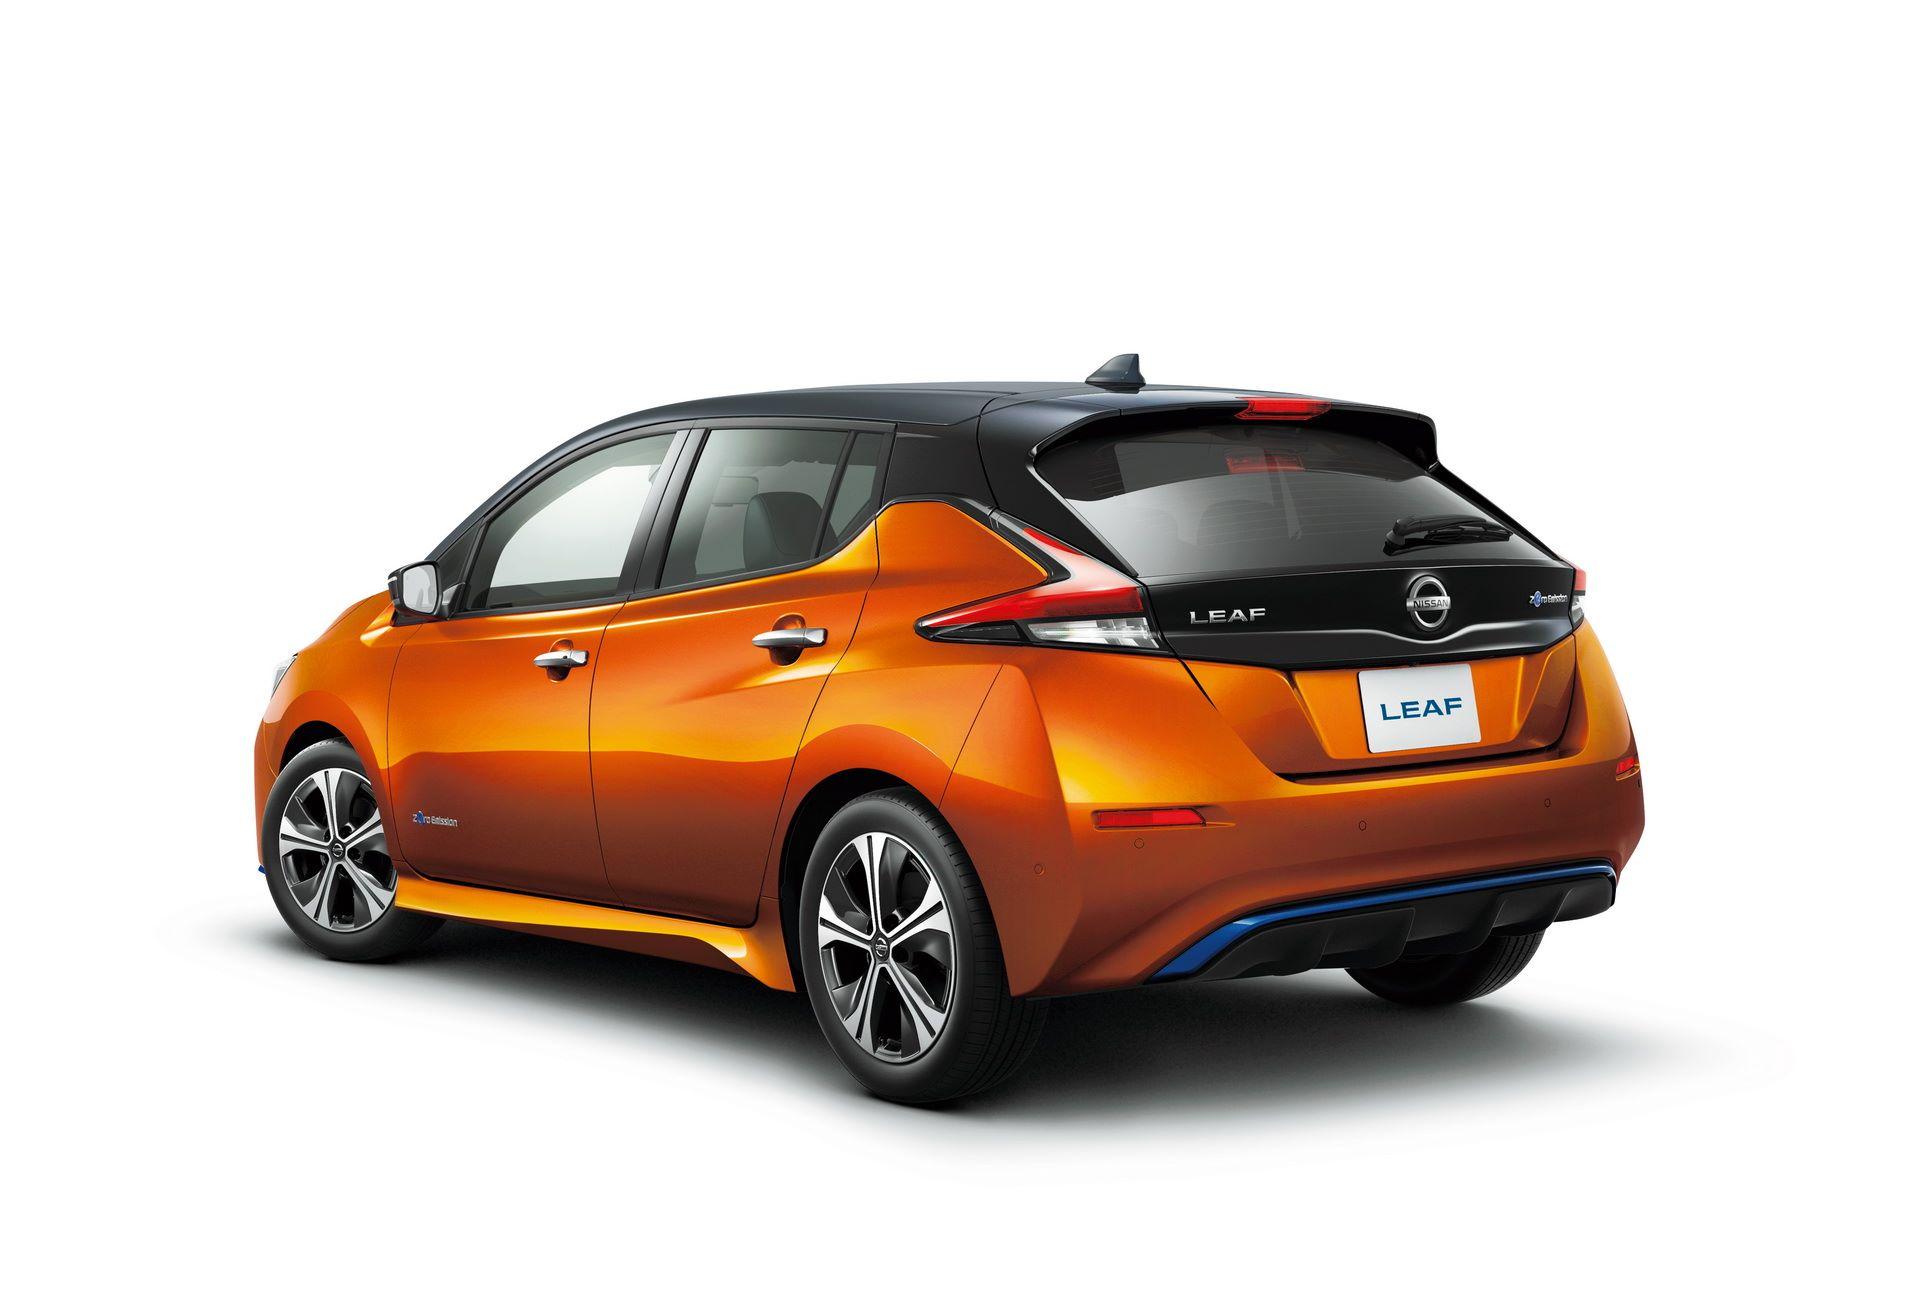 Nissan-leaf-japan-2020-2